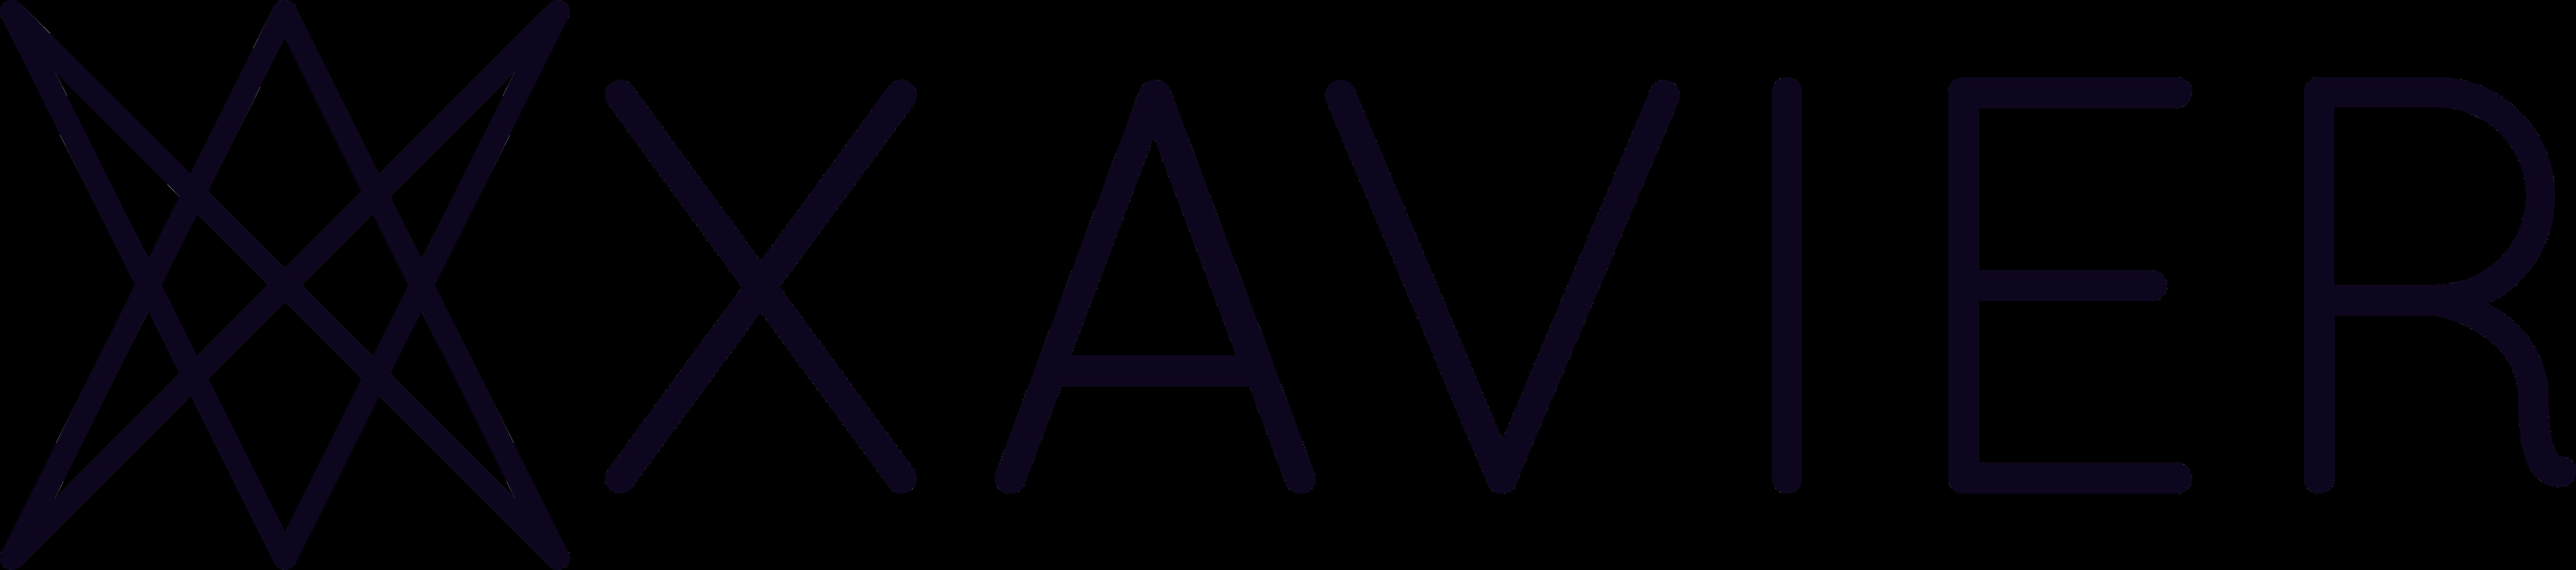 Startup for 10: Xavier Analytics - TechSPARK.co